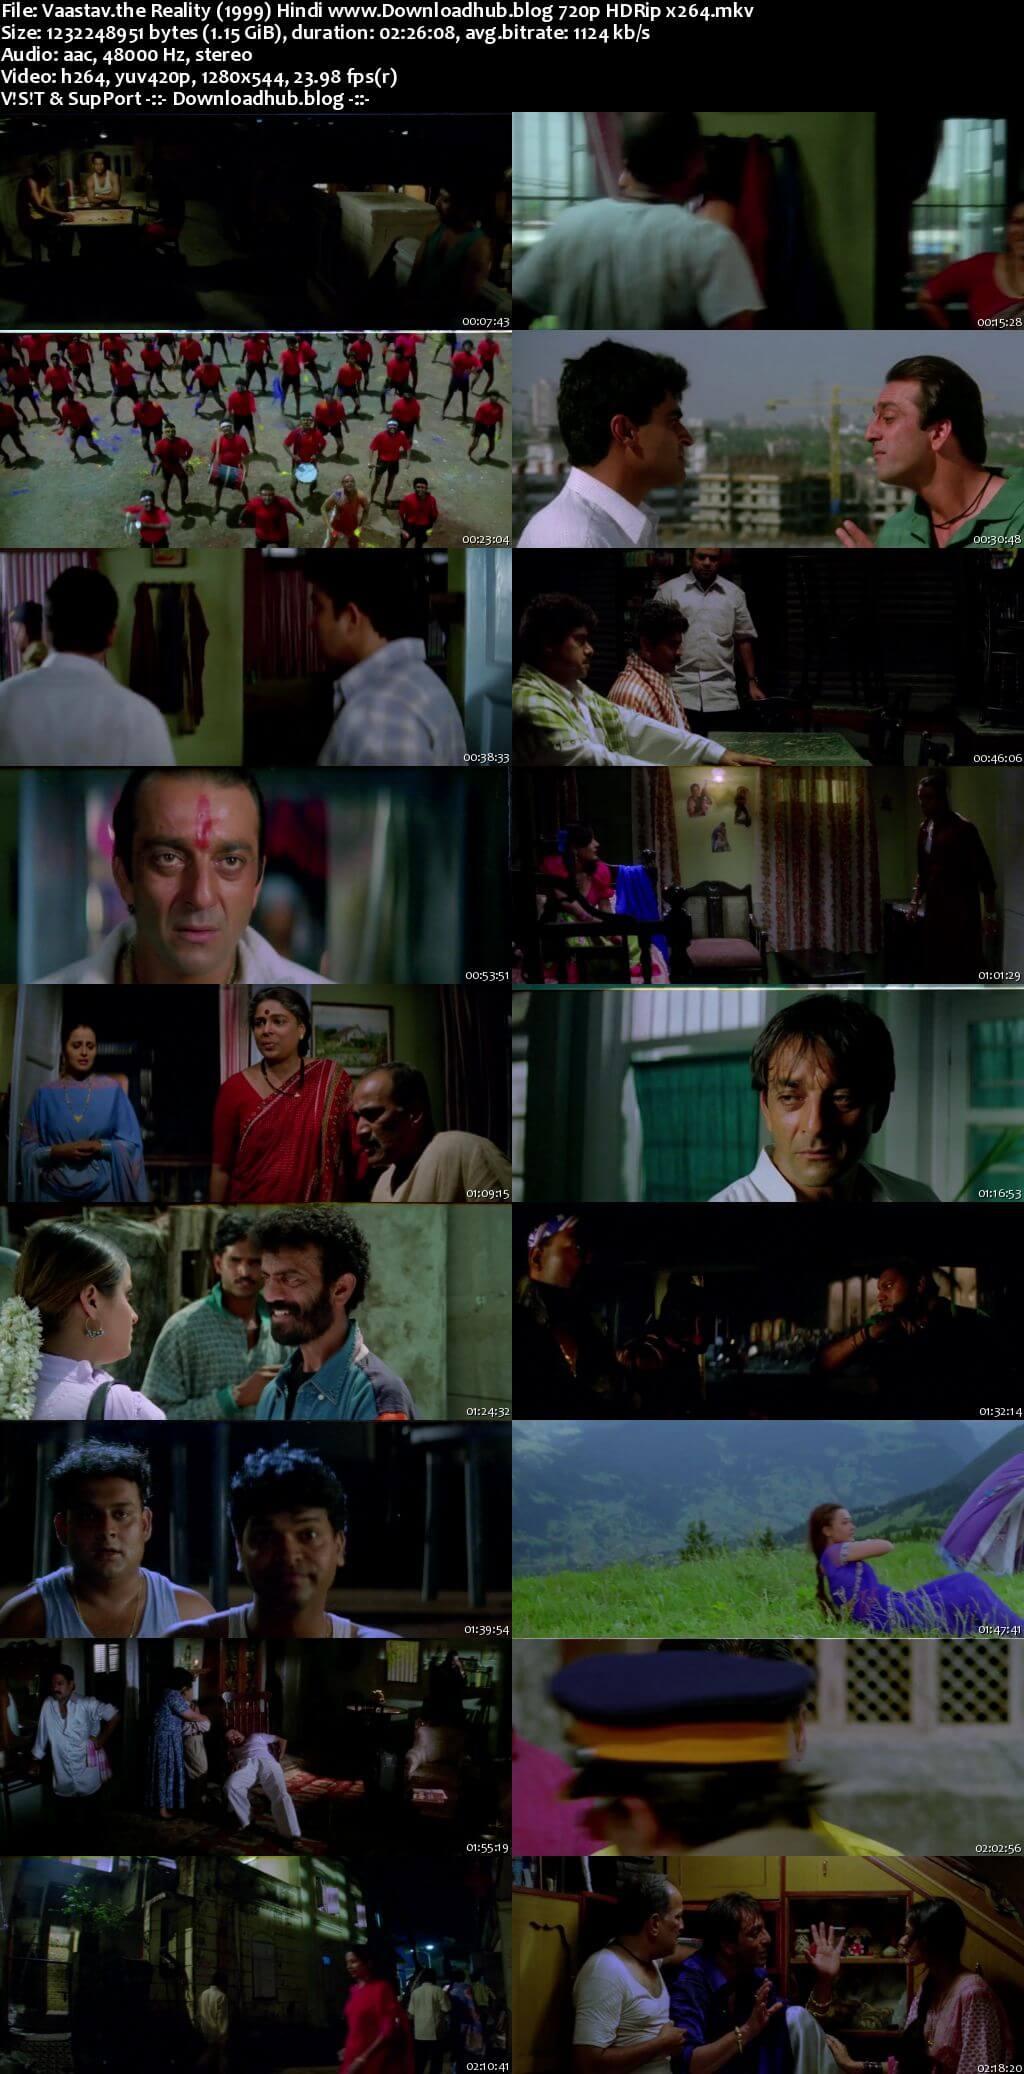 Vaastav The Reality 1999 Hindi 720p HDRip x264